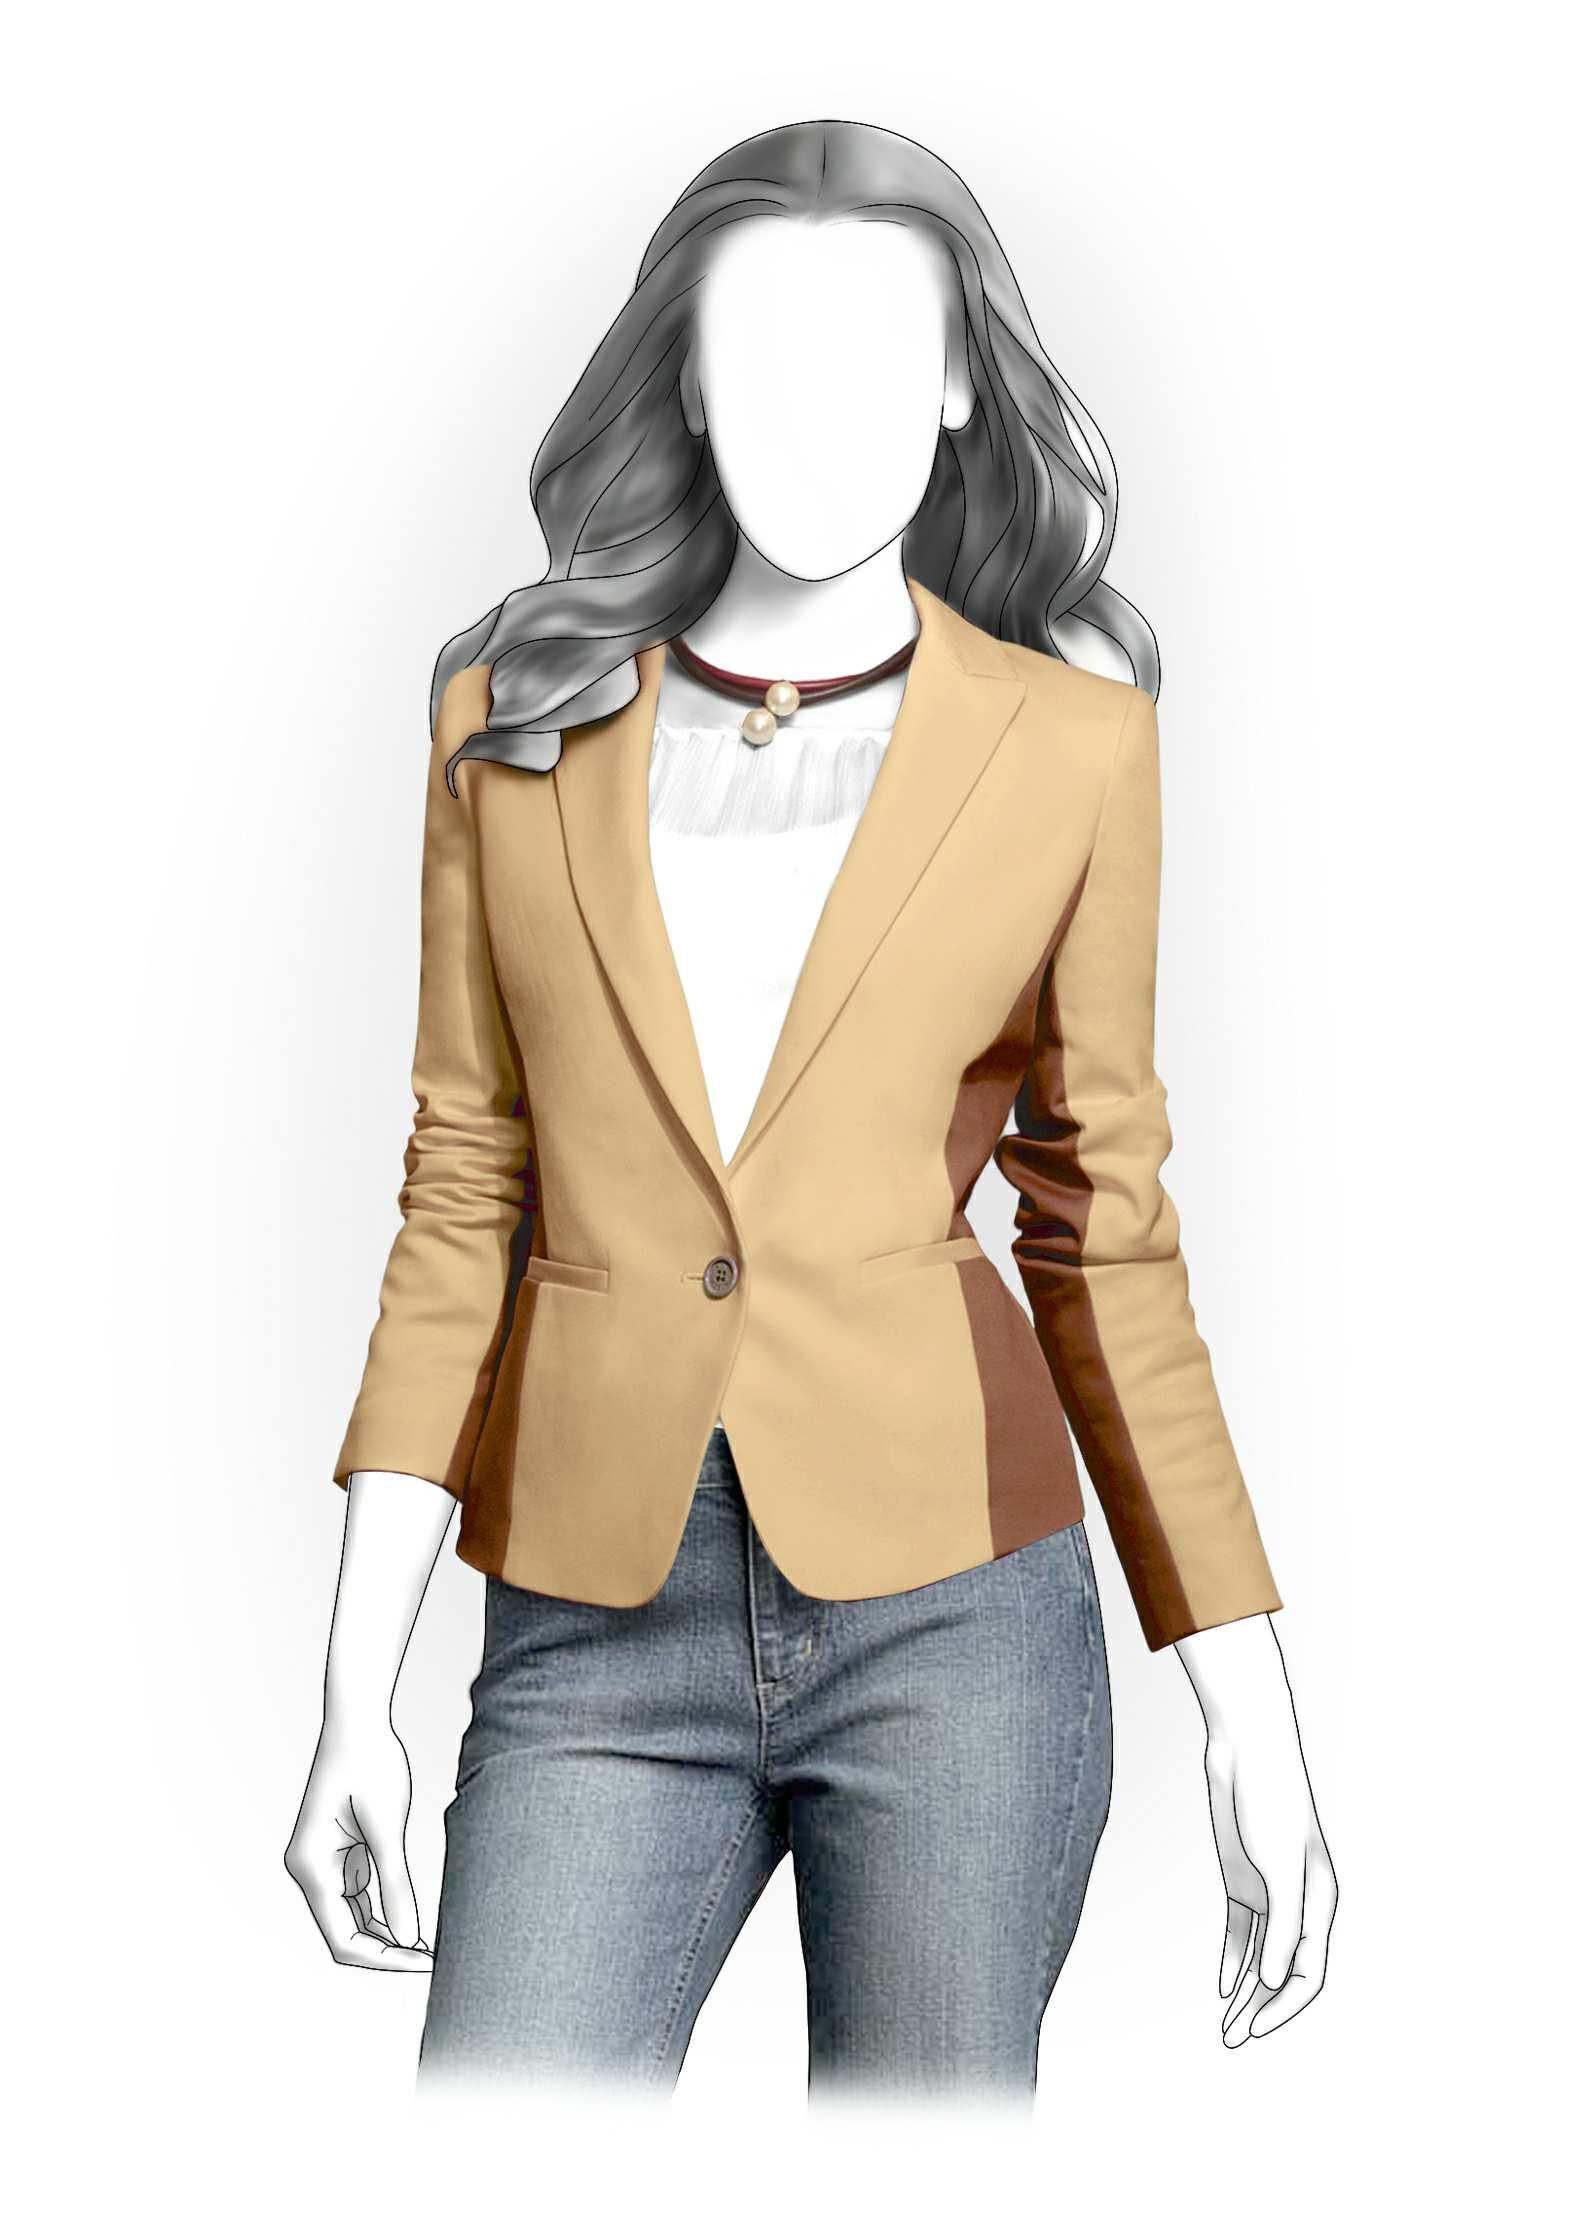 Women Blazer Patterns : women, blazer, patterns, Classical, Jacket, Sewing, Pattern, #4162, Sewing,, Patterns, Women,